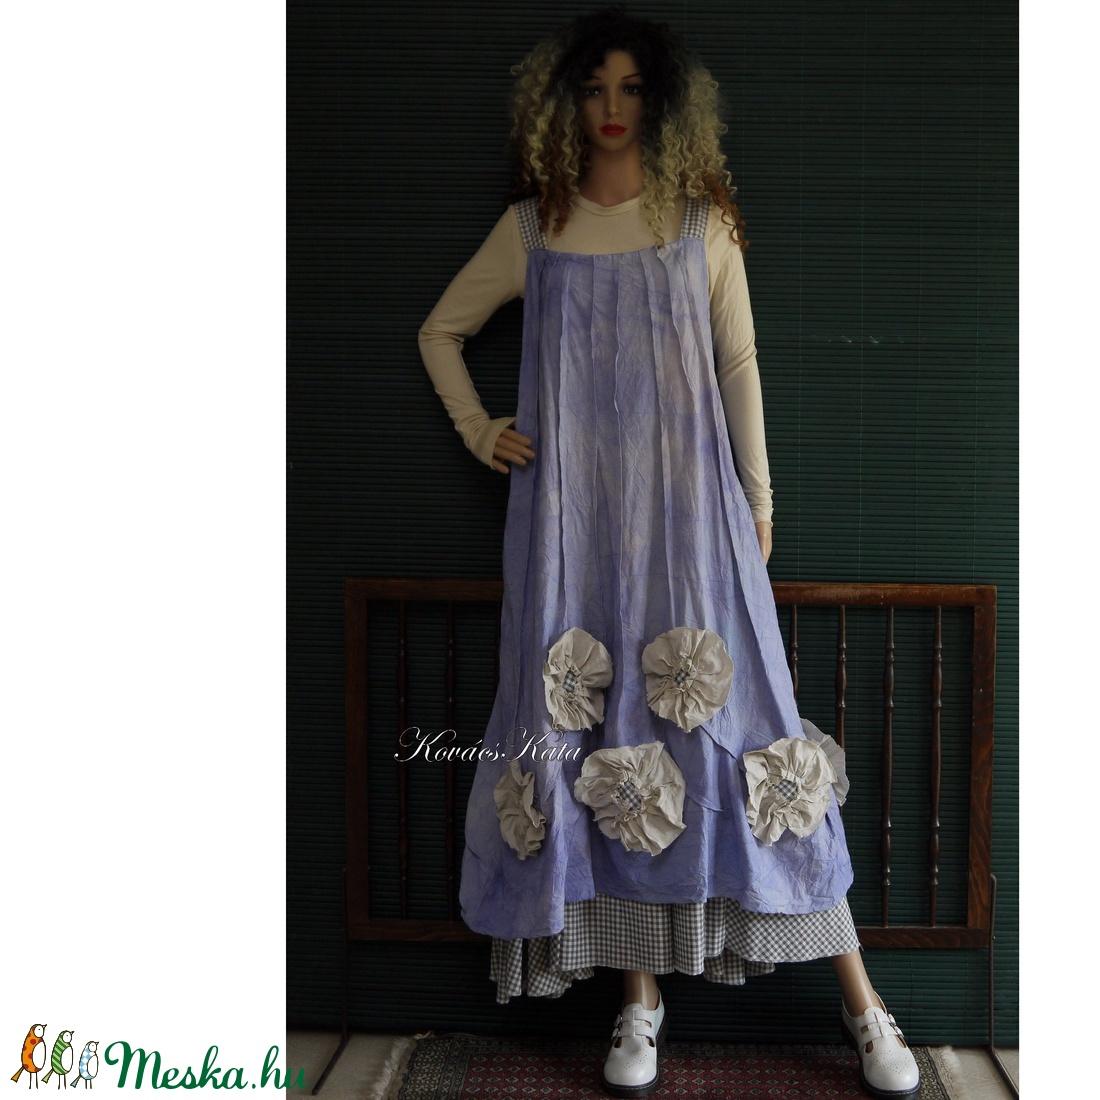 PITYPANGOS - design kötényruha - Artsy slip - ruha & divat - női ruha - ruha - Meska.hu